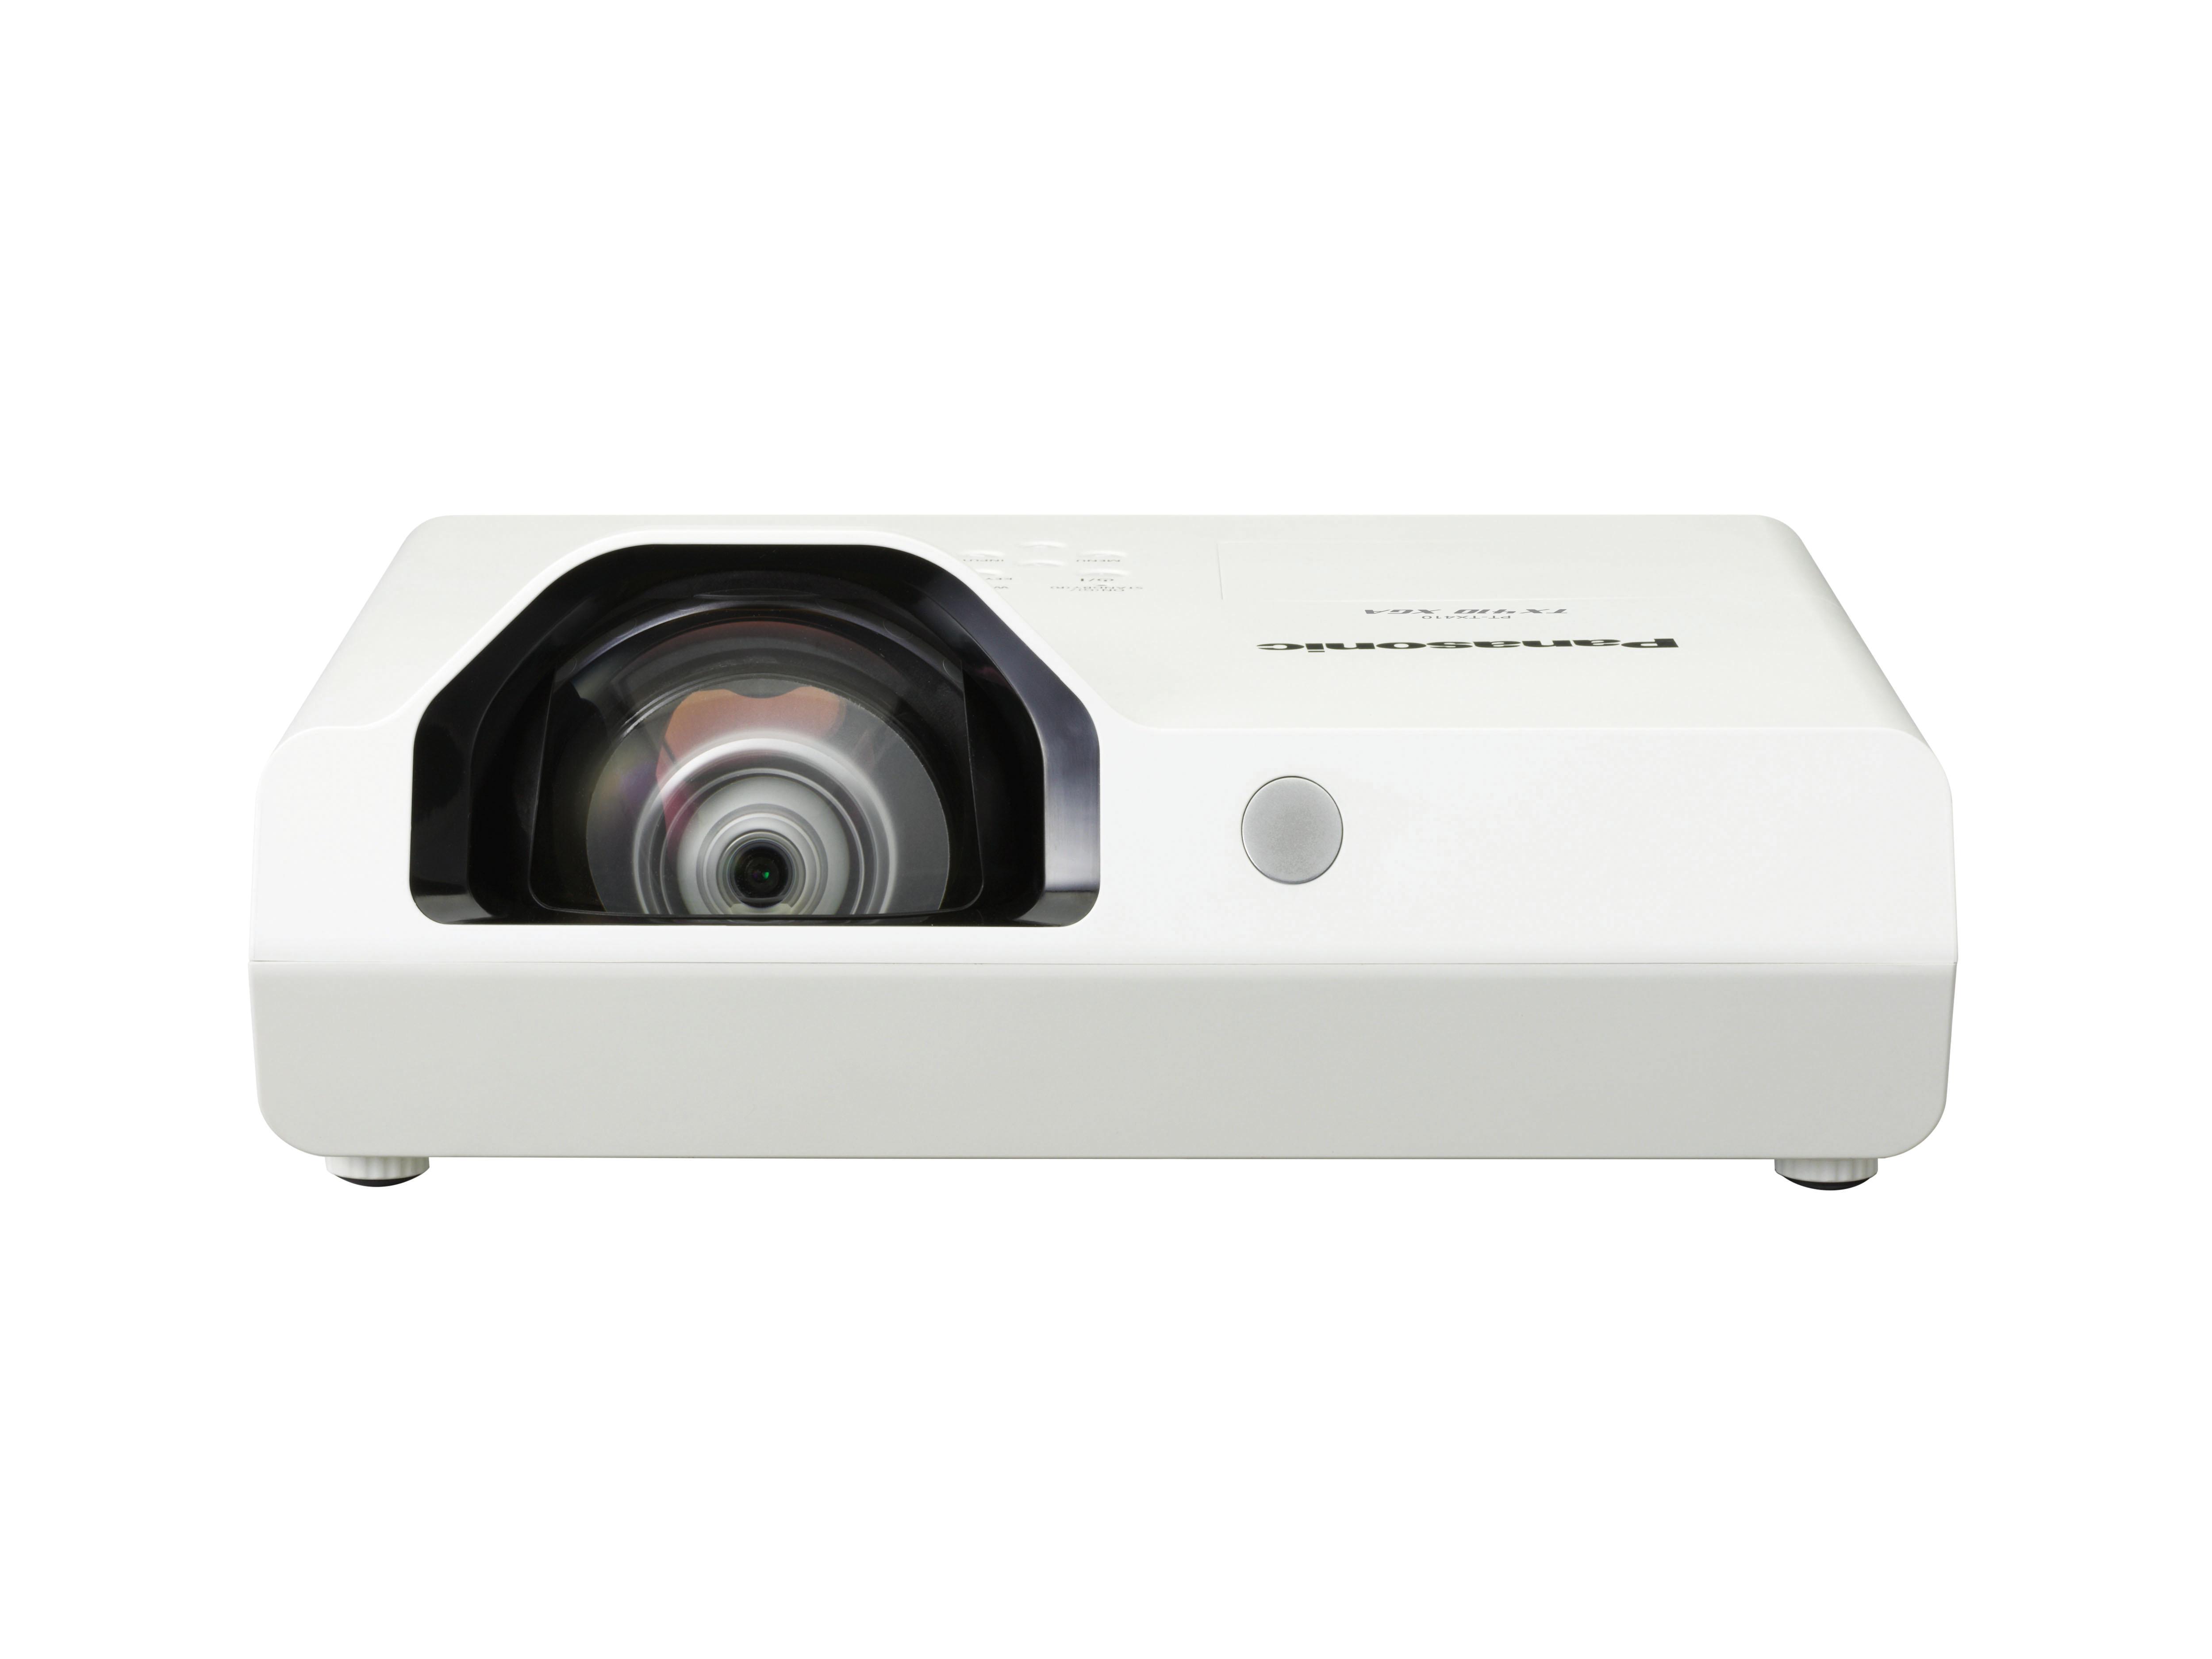 Videoproiector Panasonic PT-TX410 XGA title=Videoproiector Panasonic PT-TX410 XGA